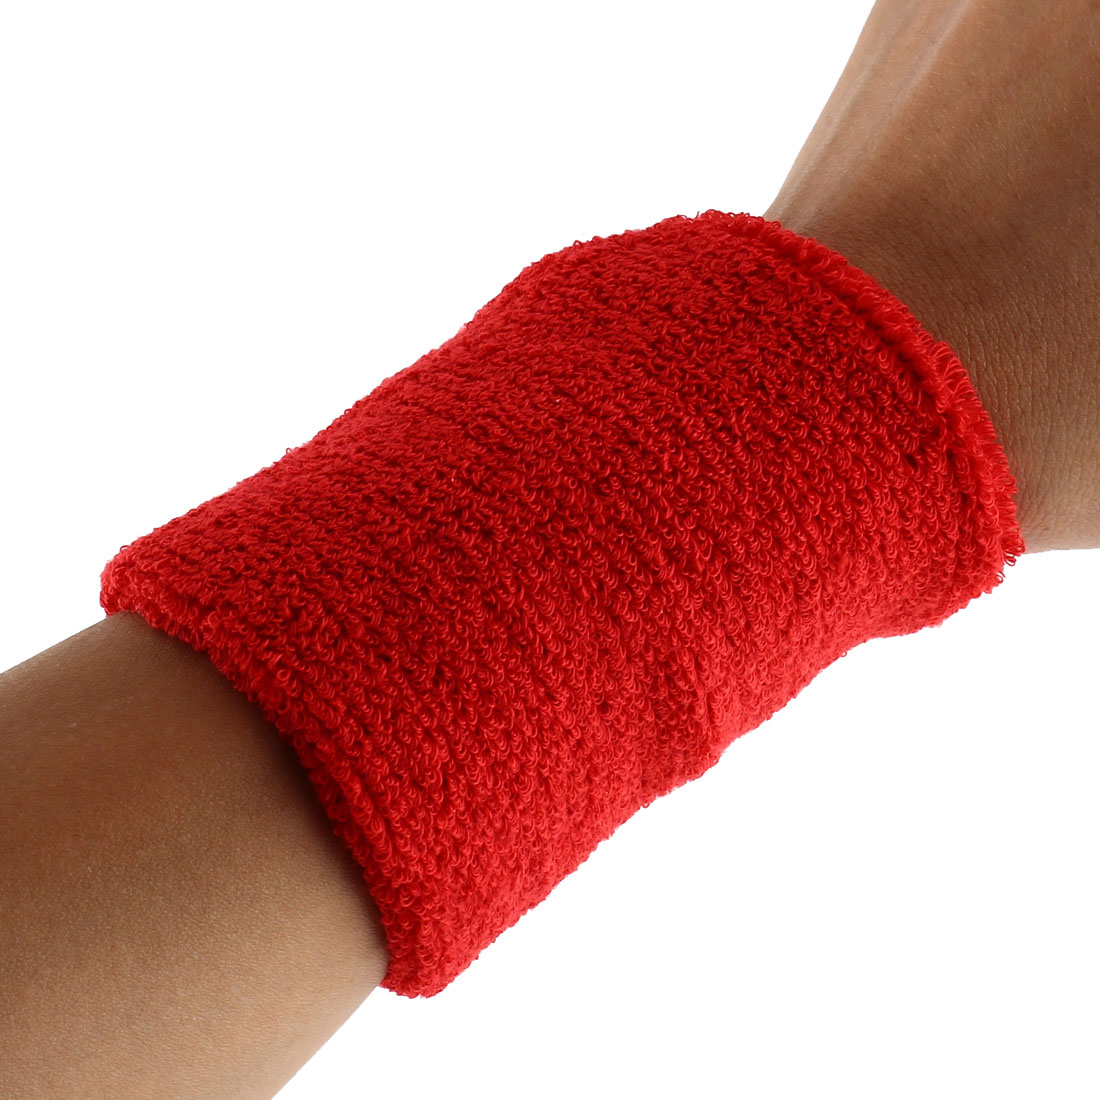 Exercises Gym Running Elastic Breathable Hand Protector Bandage Sweatband Wristband Sport Wrist Red 2pcs